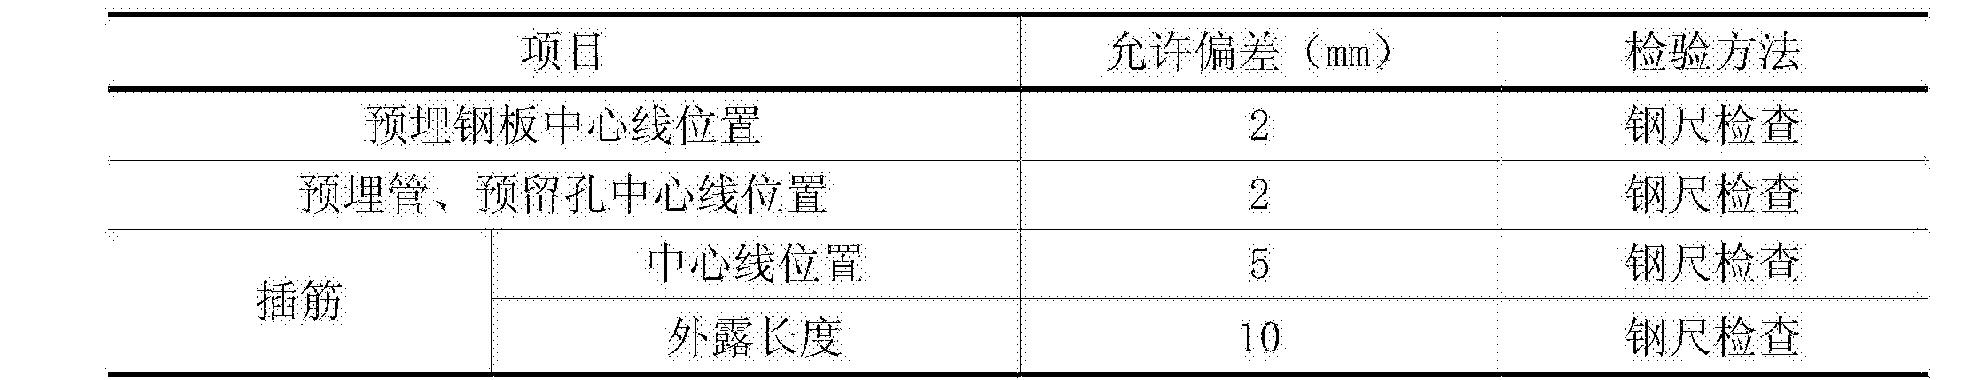 Figure CN106639500AD00061